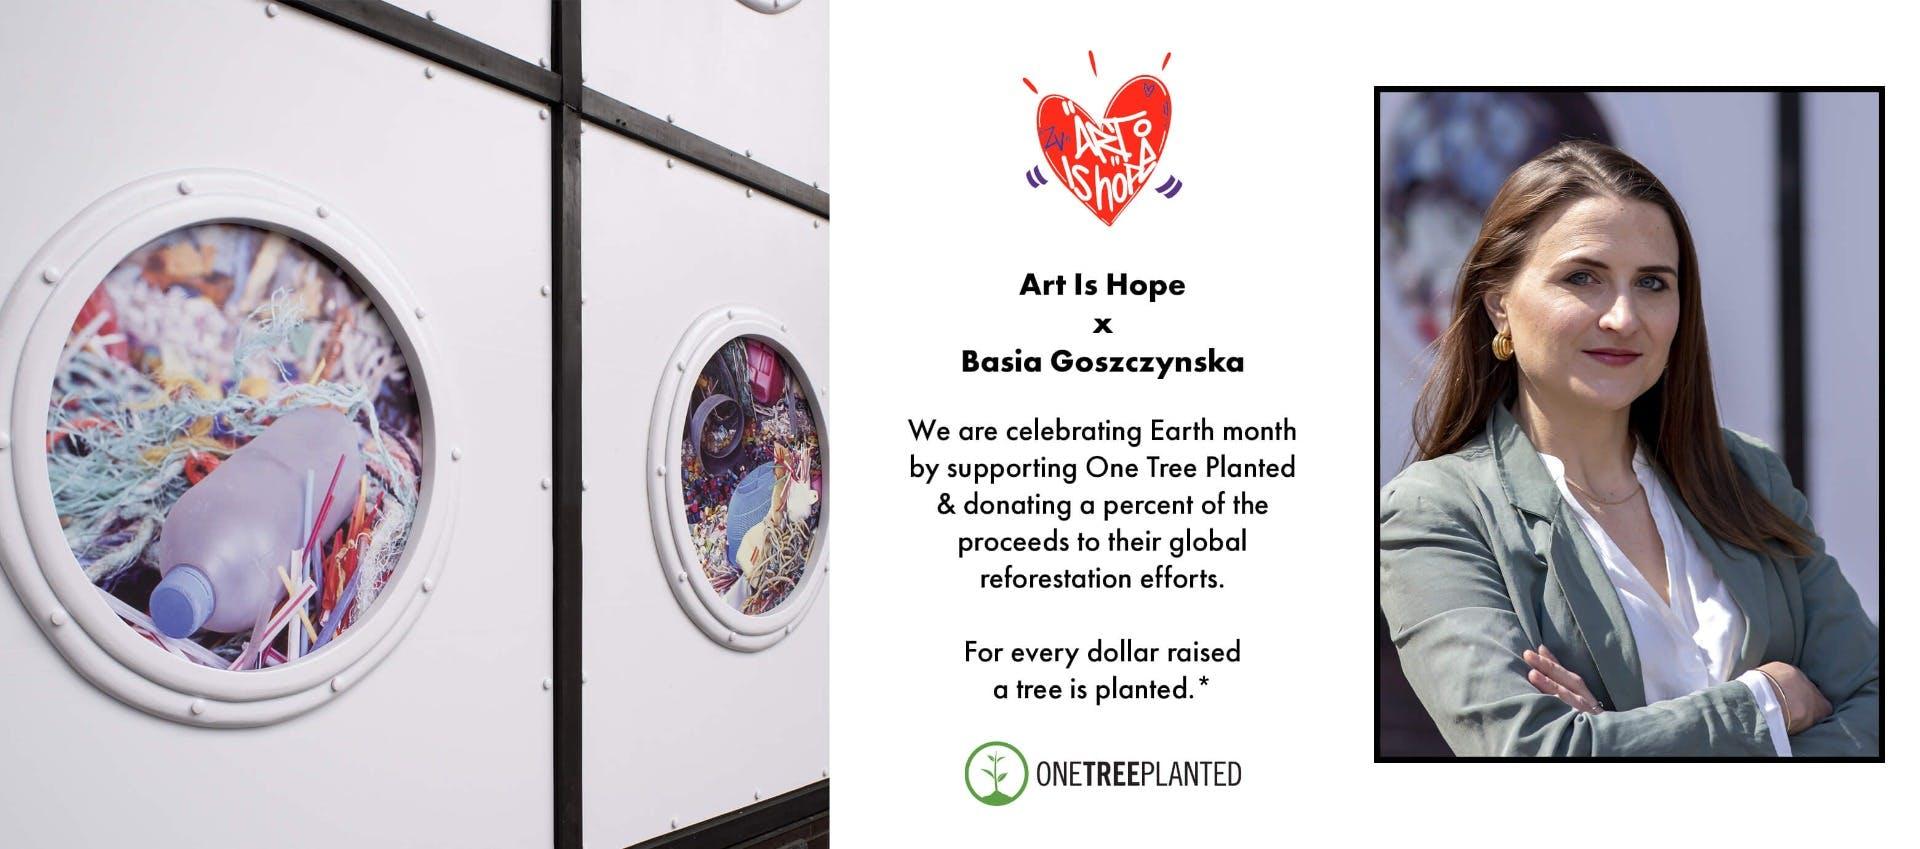 Art Is Hope Introducing Artist Basia Goszczynska Banner